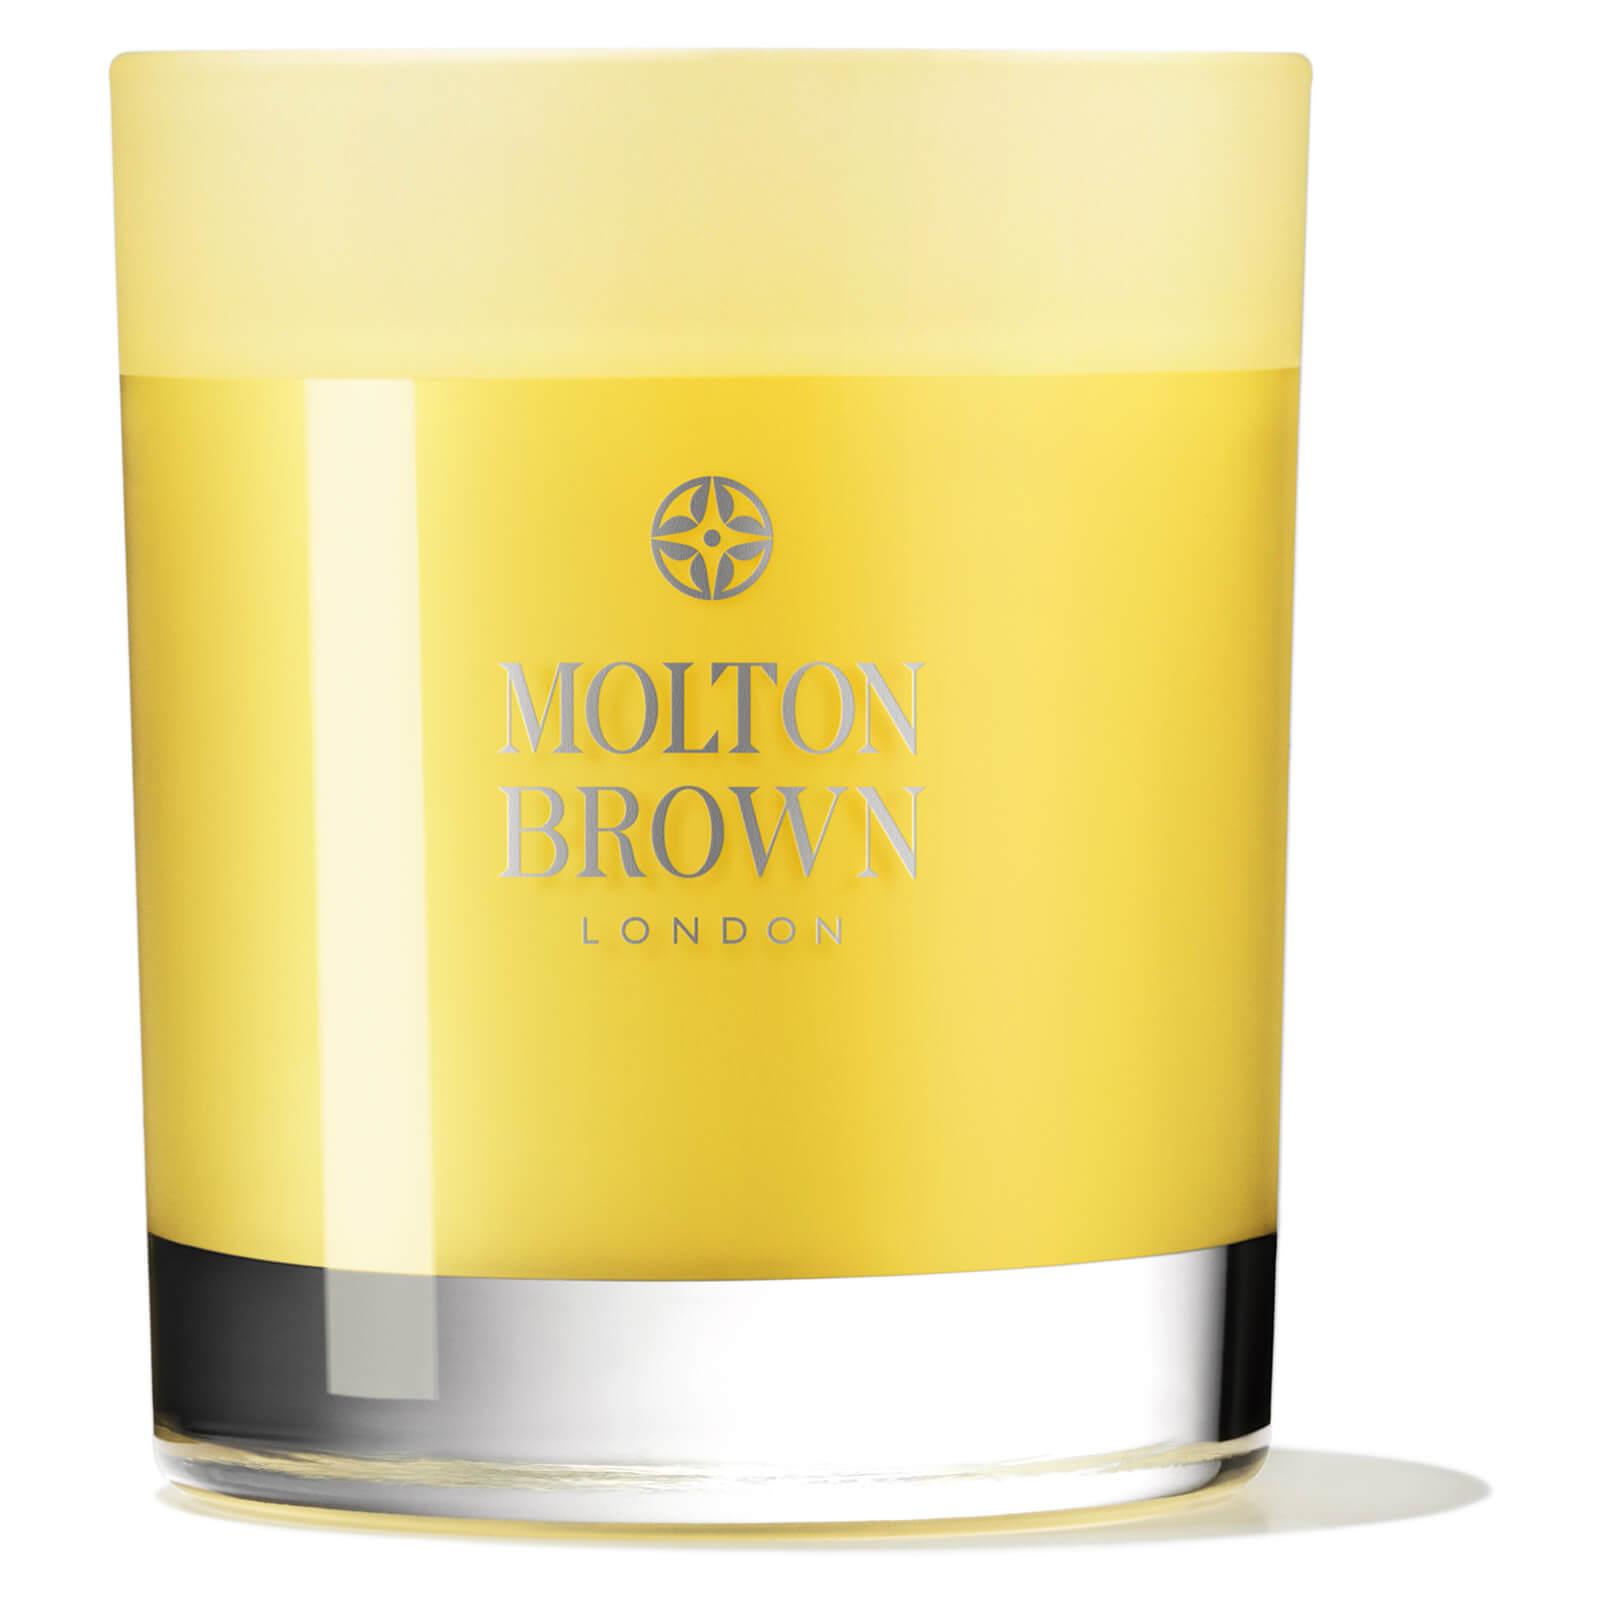 Molton Brown Orange and Bergamot Single Wick Candle